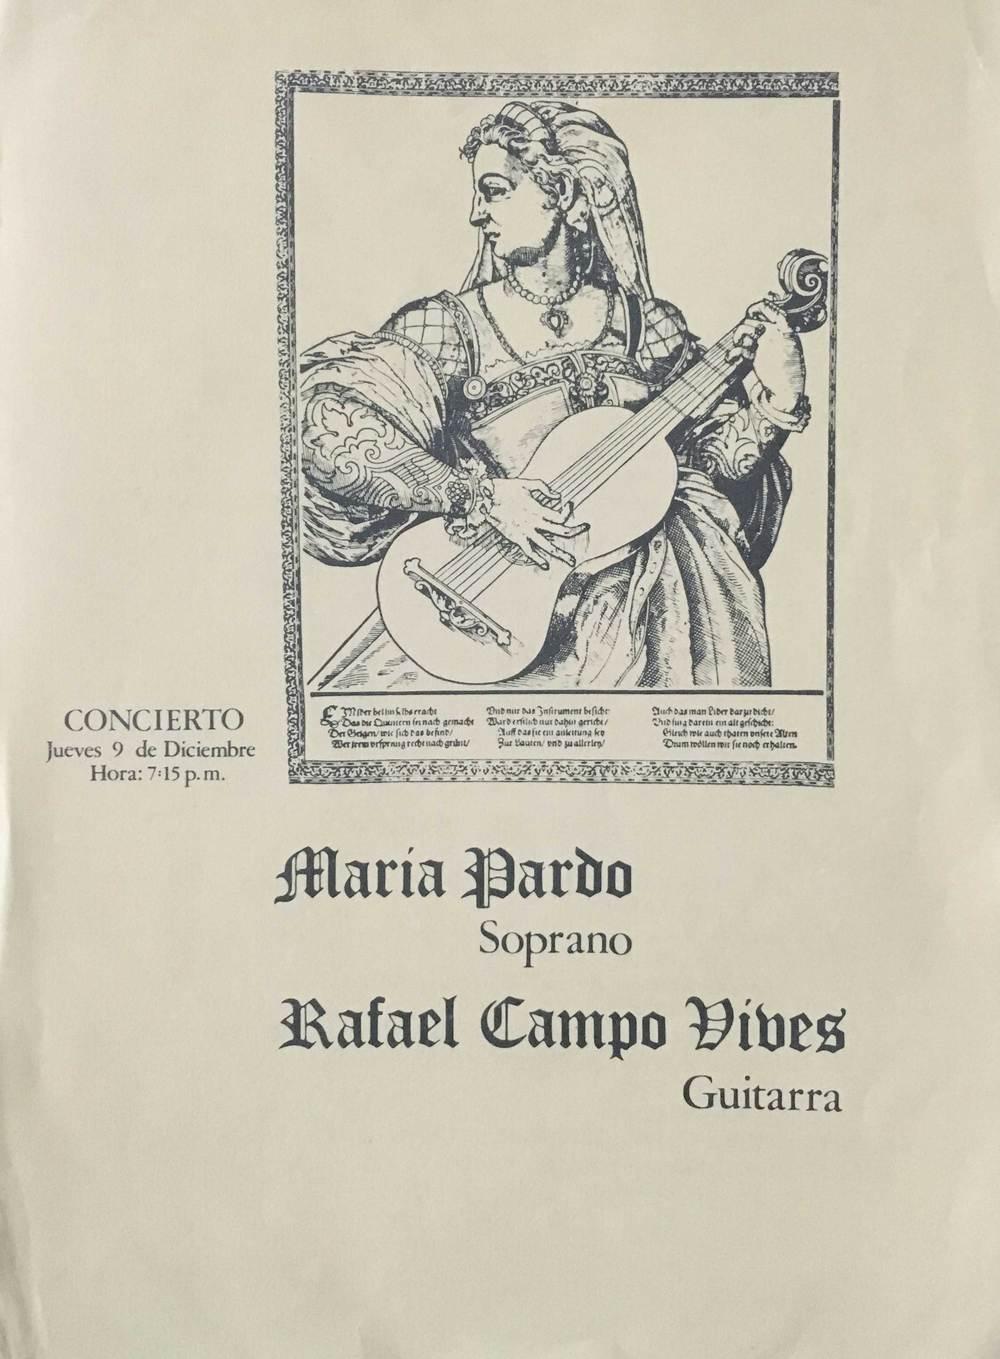 musica_medieval_y_renacentista_2.JPG